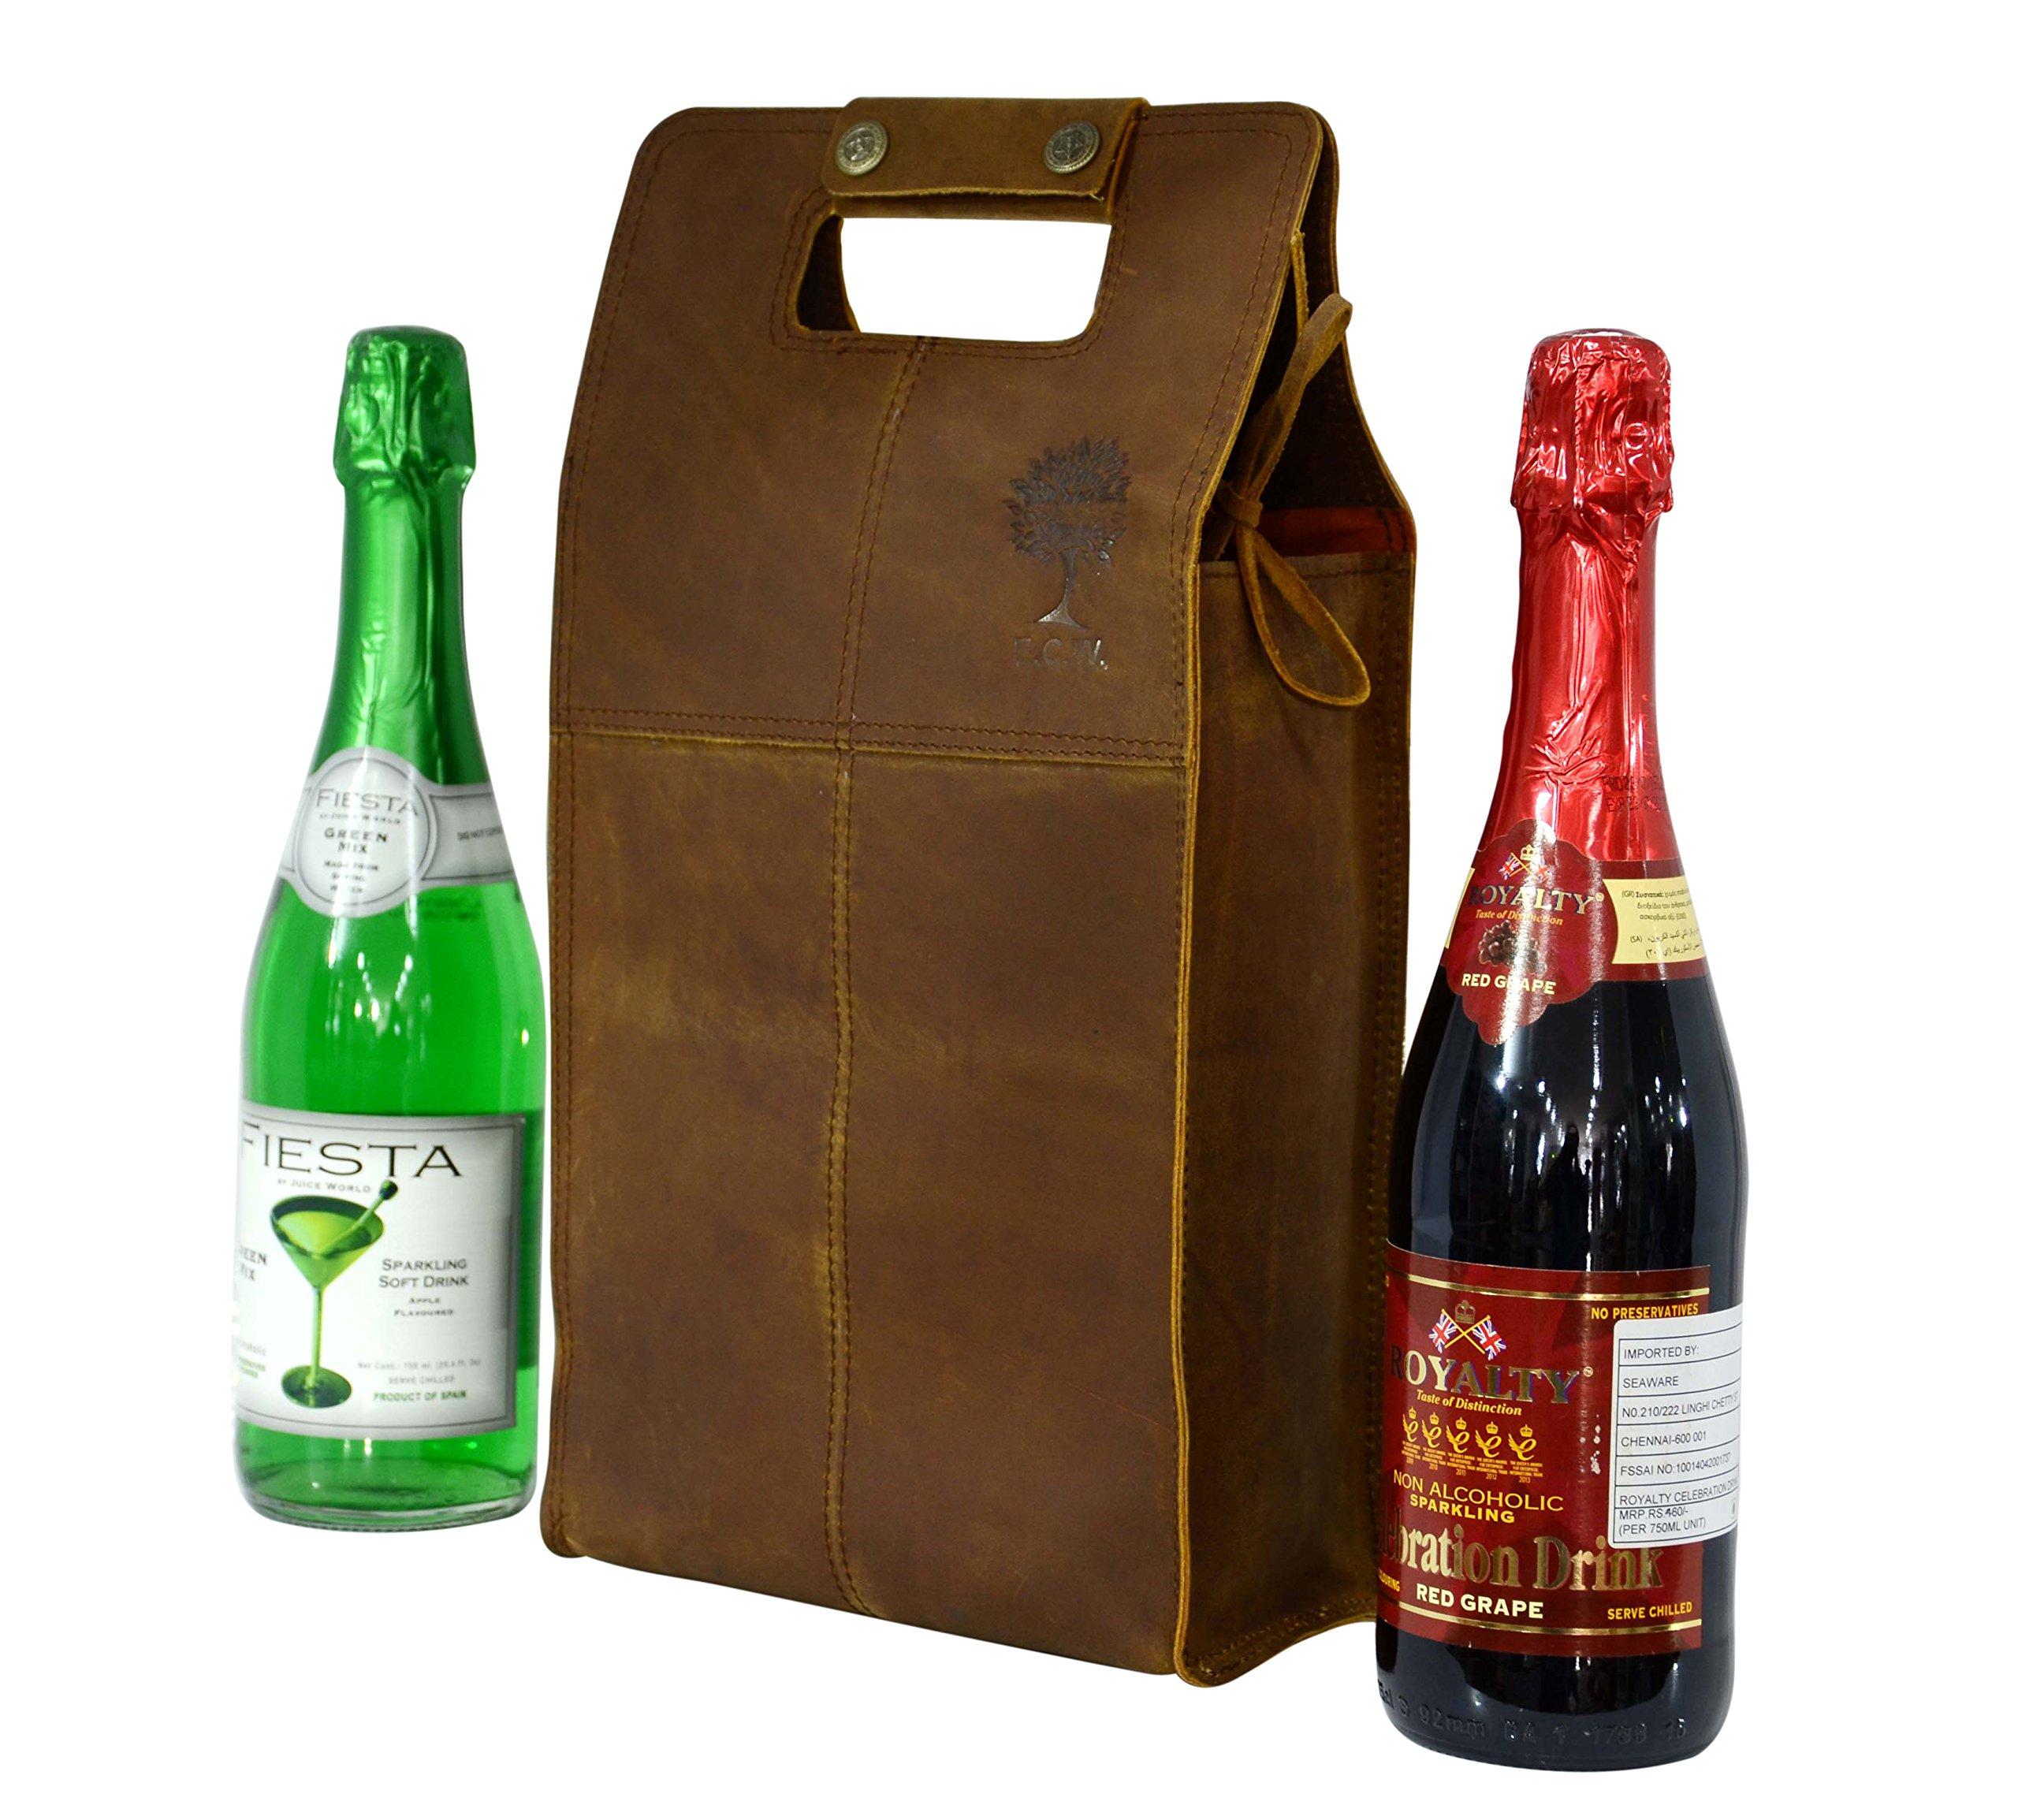 Double Wine Bottle Carrier Bag Leather Bottle Holder Tote Reusable Gift Bag Champagne Case, Valentines Gift Bag by ECOCRAFTWORLD (Image #1)